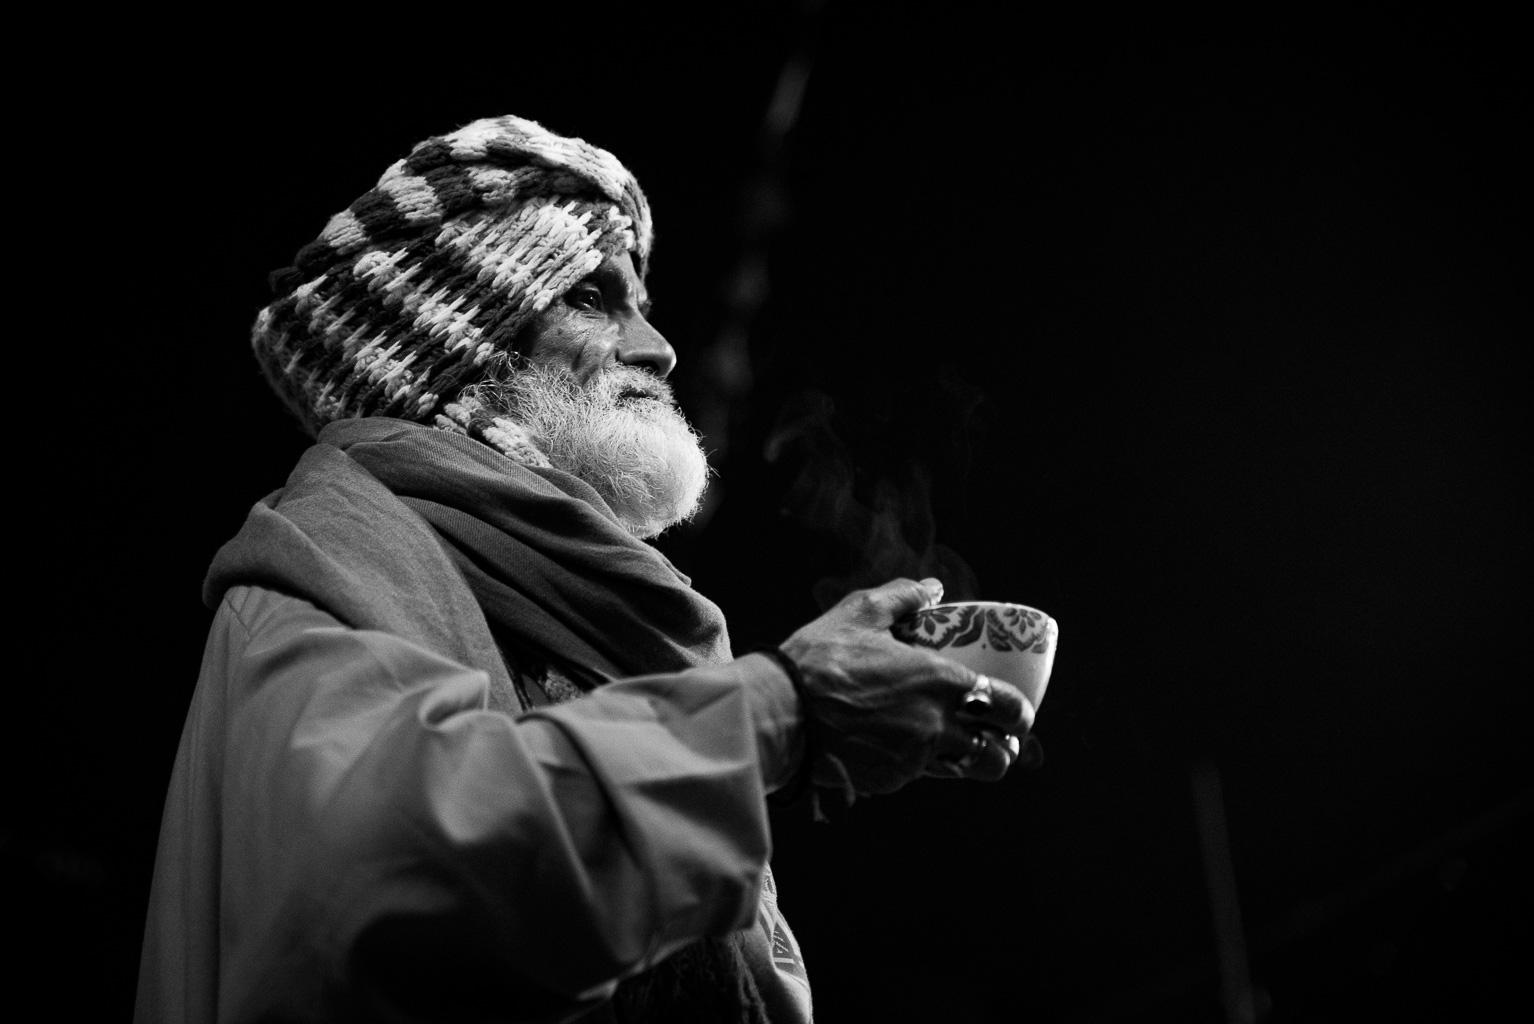 Alter pakistanischer Sufi mit Tee